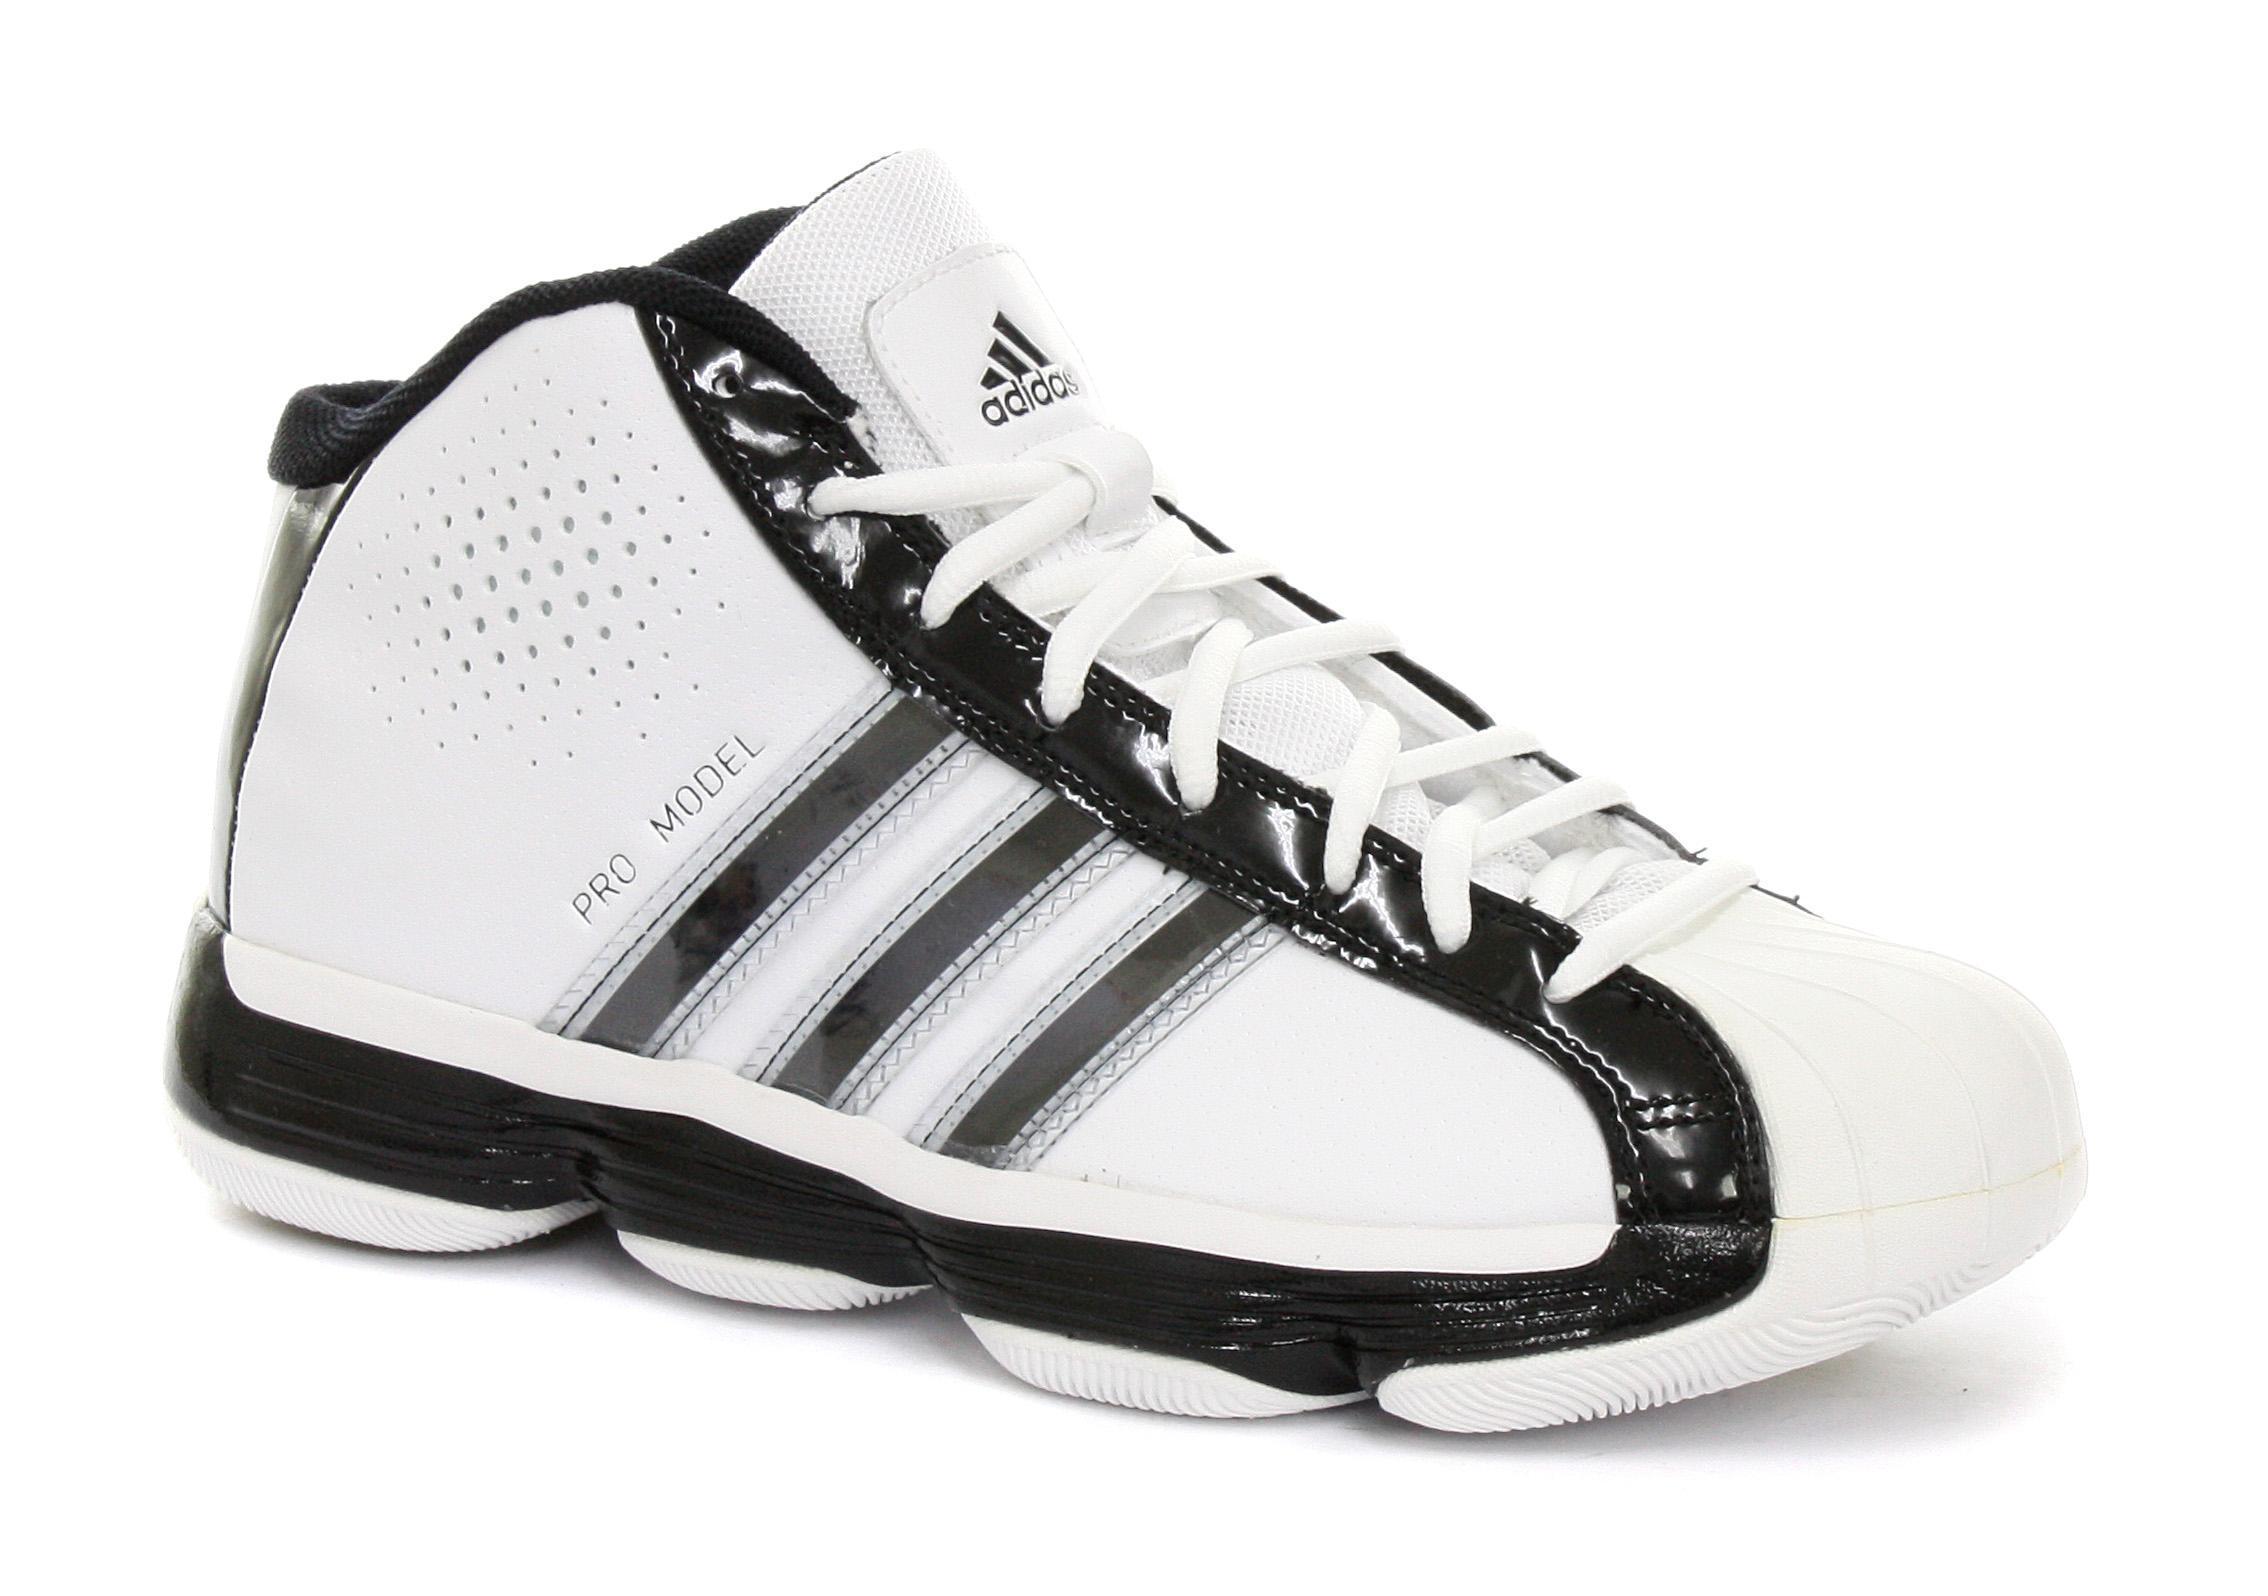 Adidas basketball shoes 2010